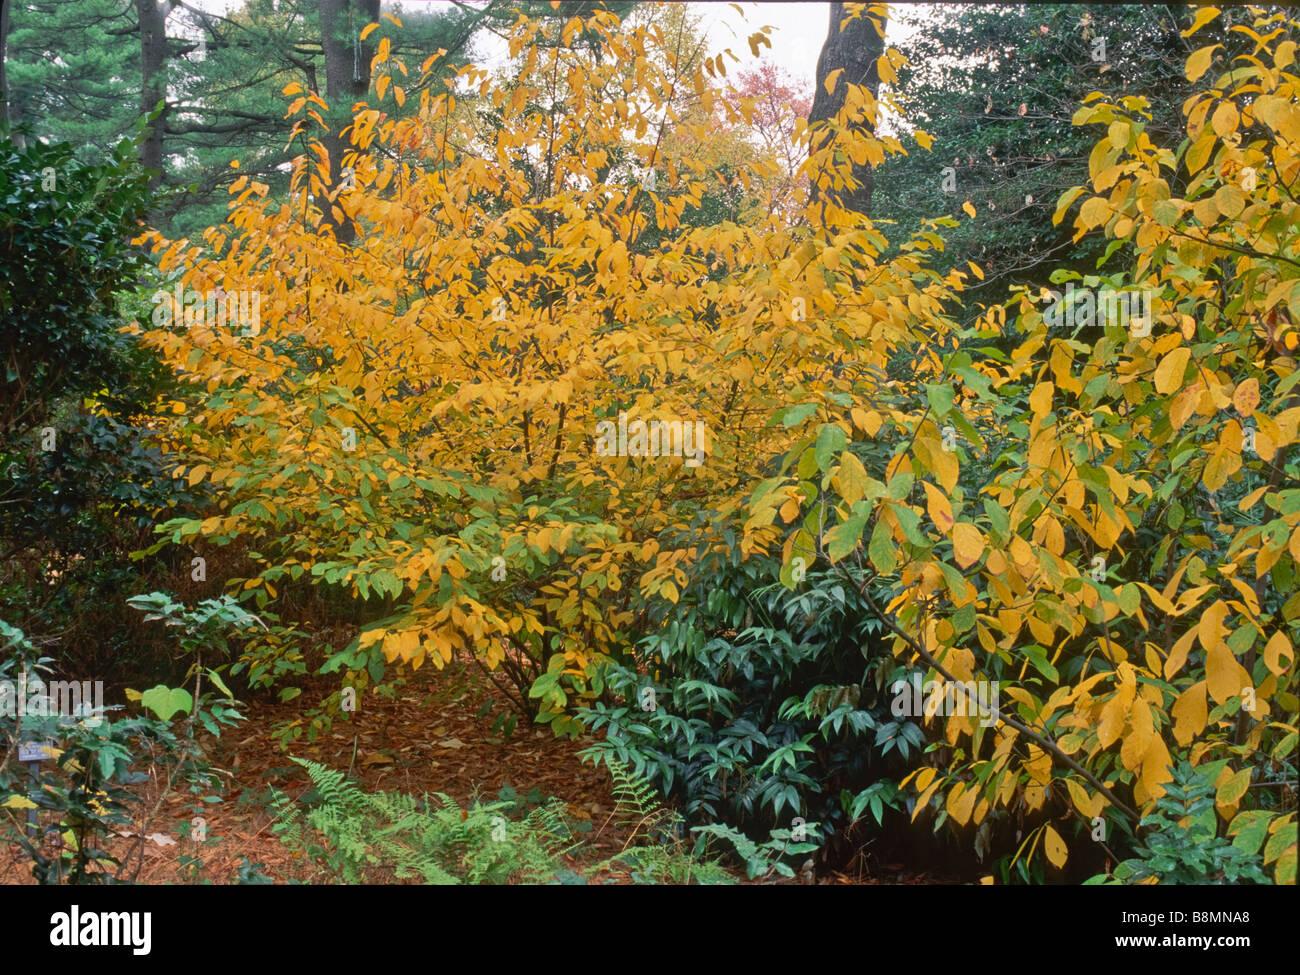 the native shrub lindera benzoin spicebush with its